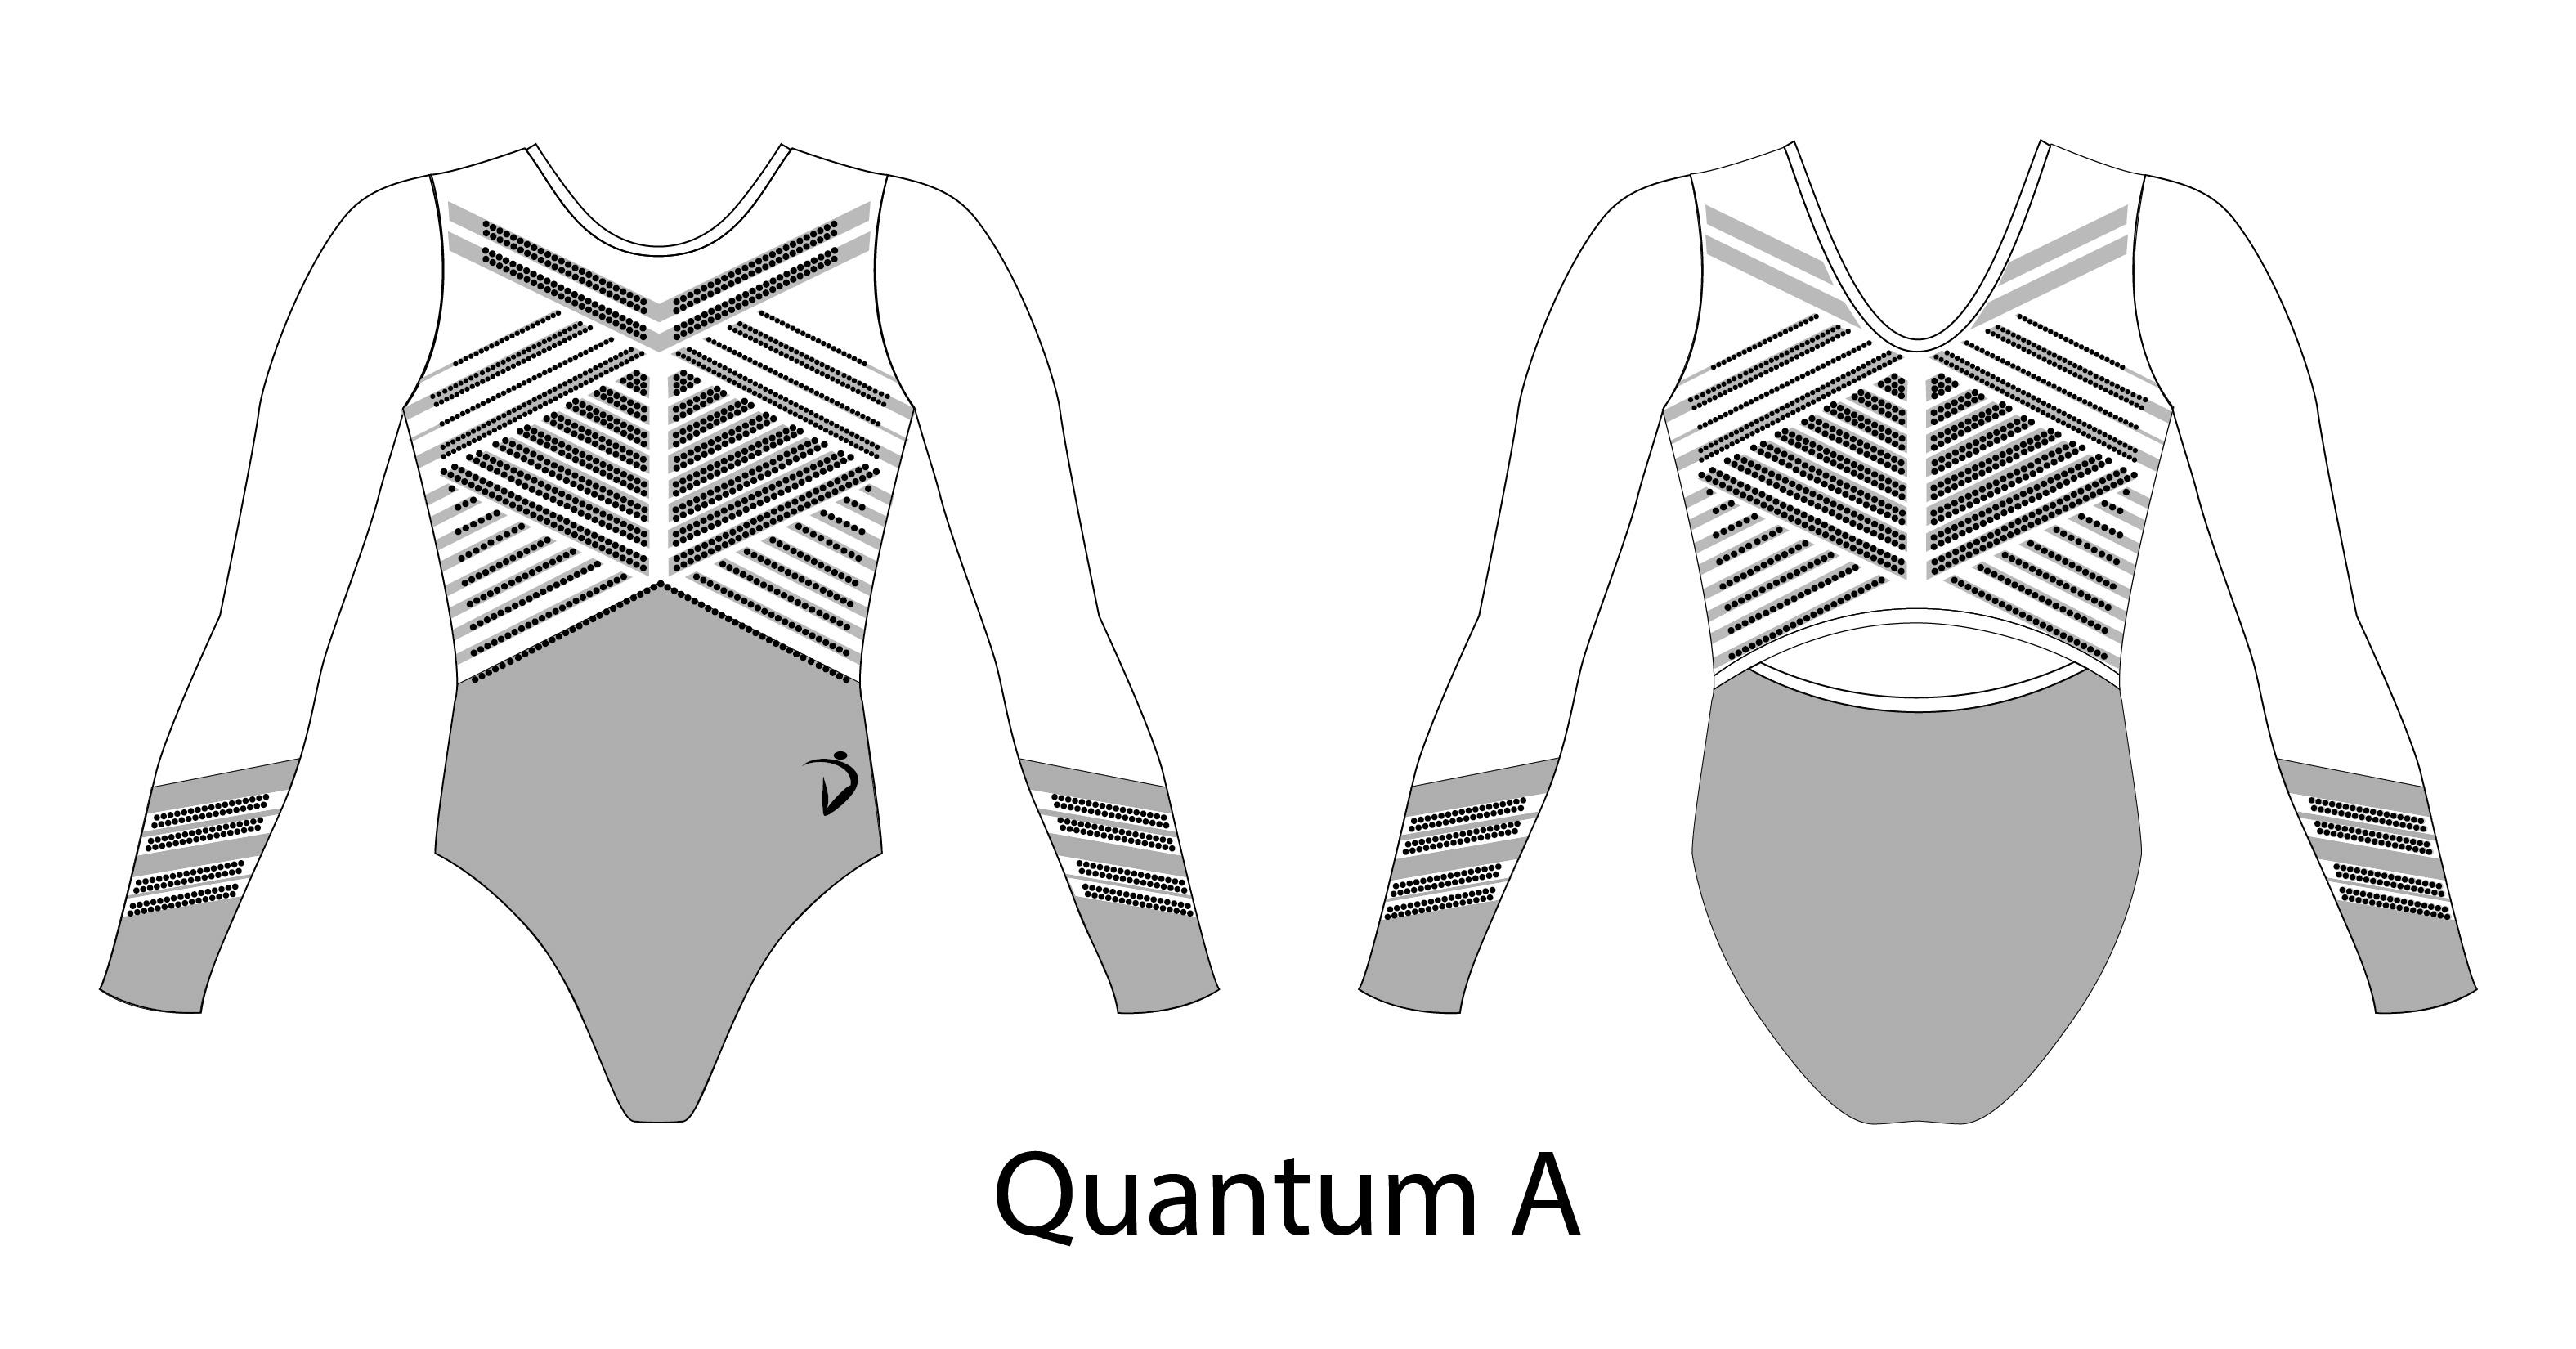 Quantum A